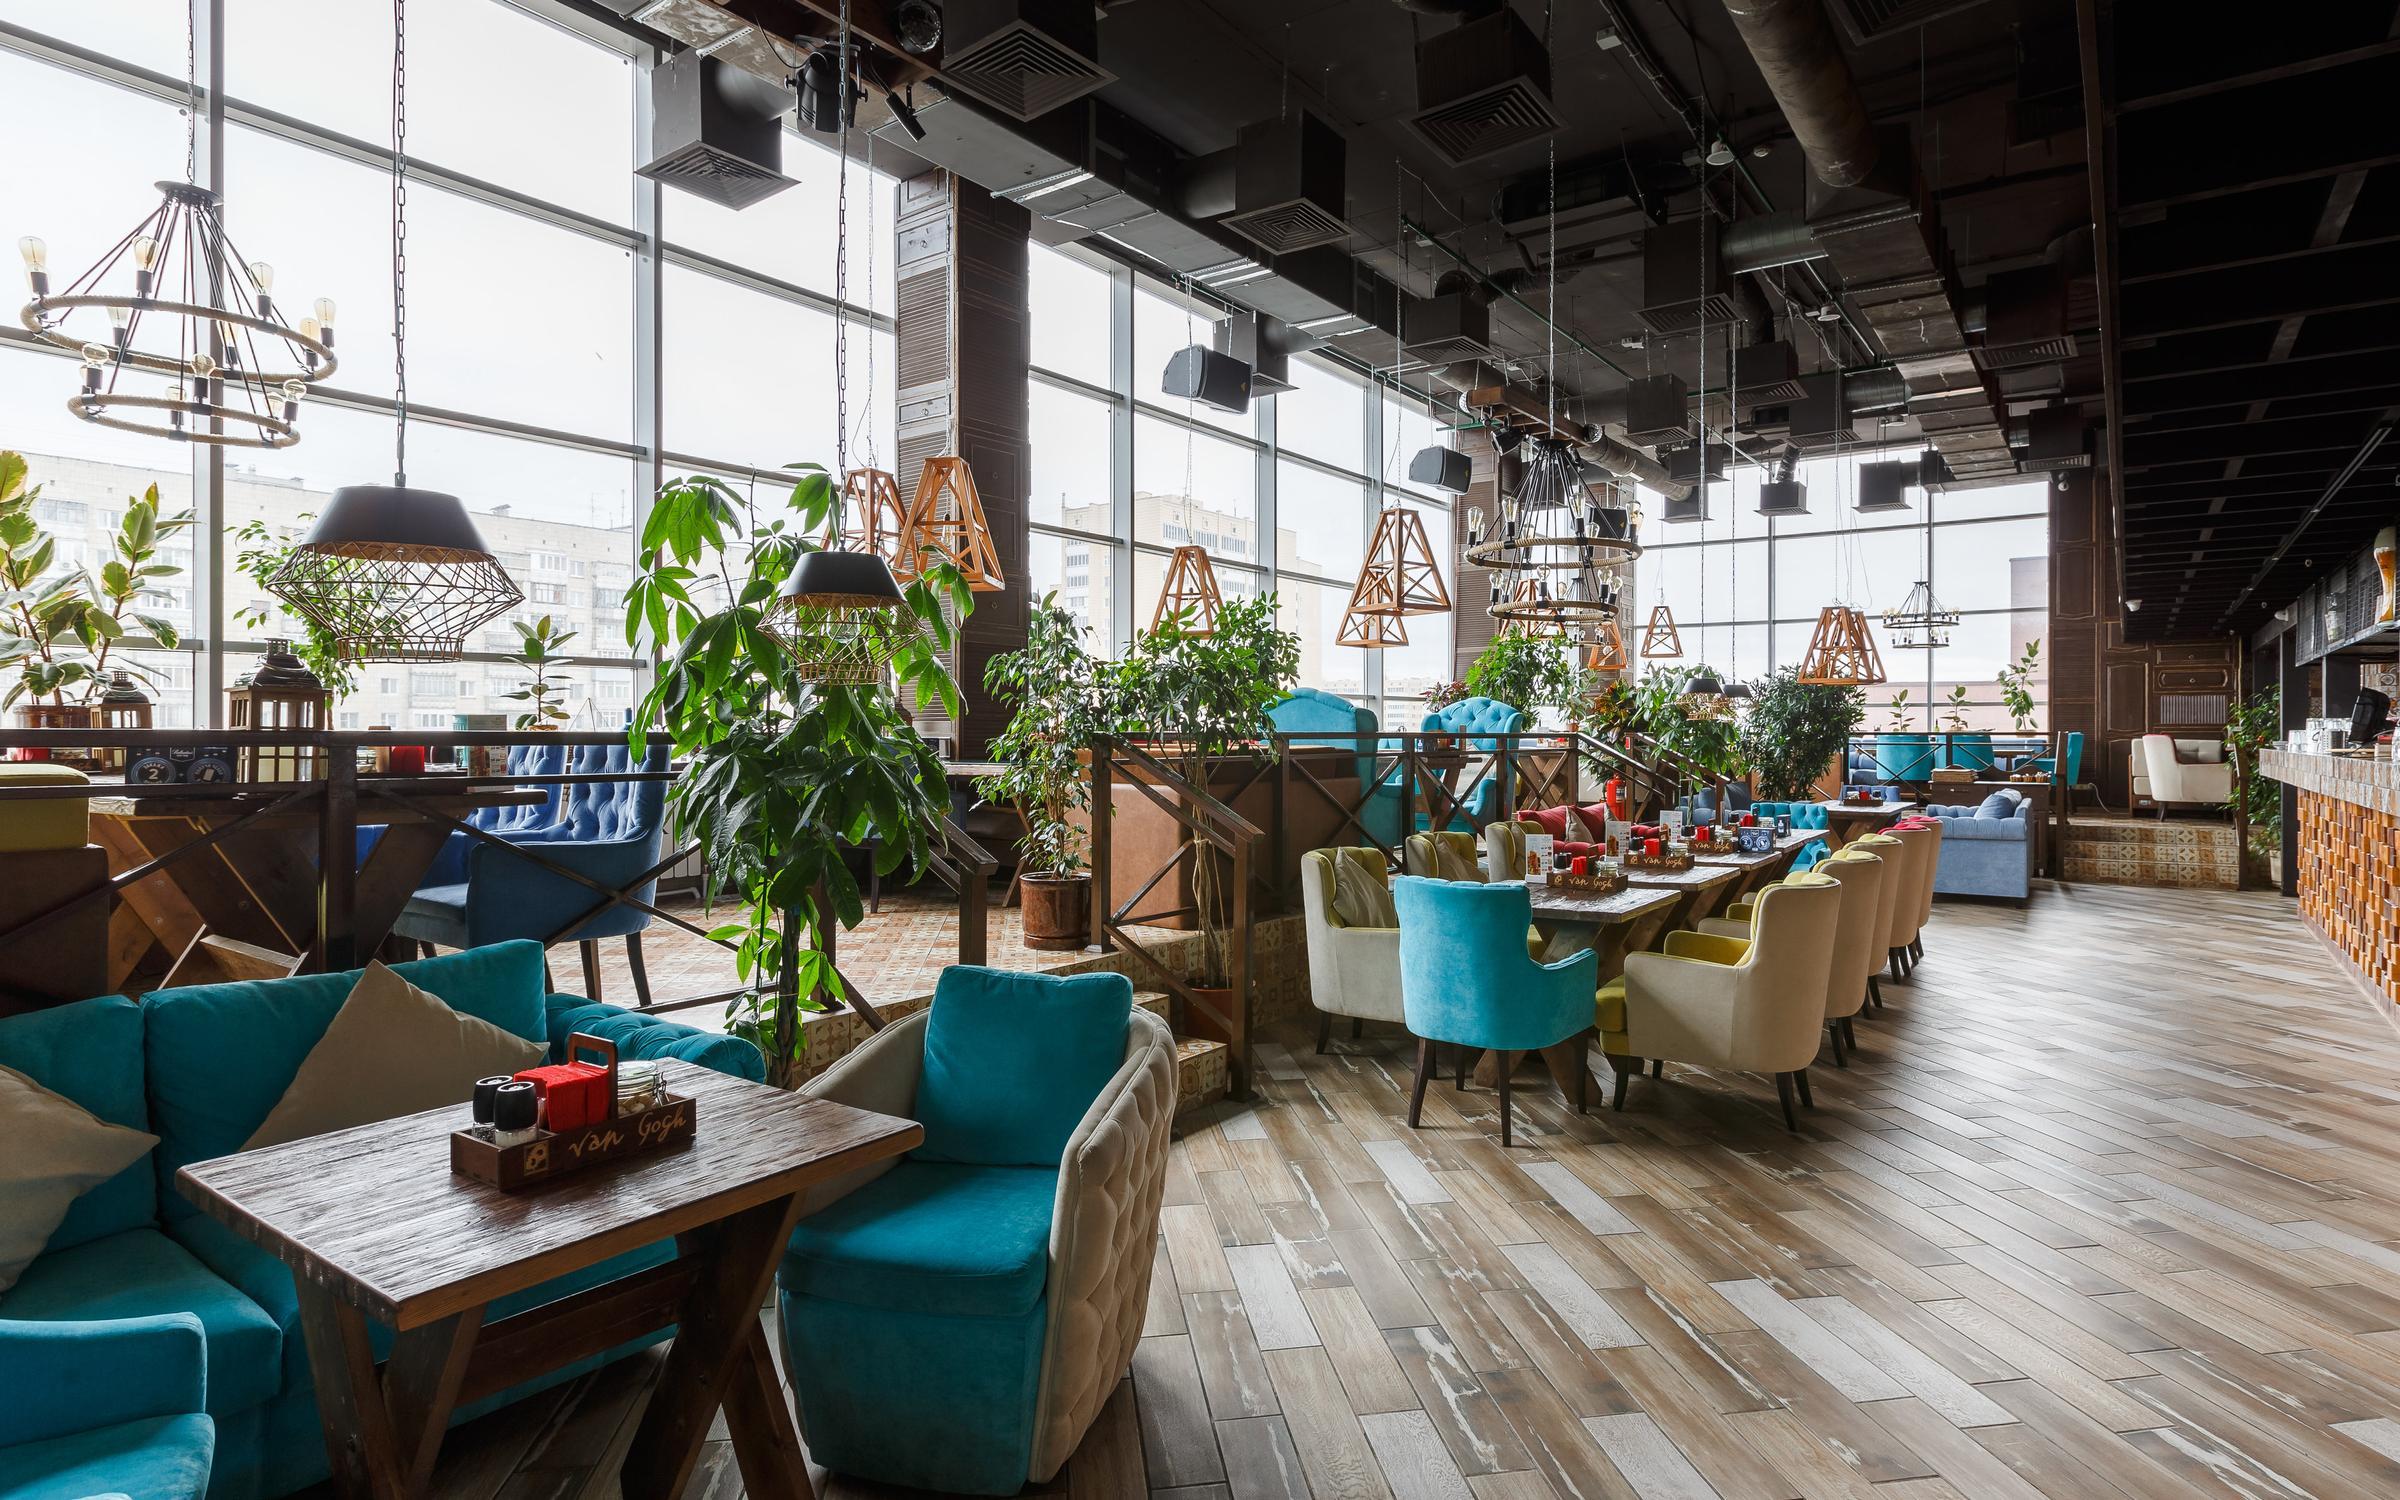 фотография Панорамного ресторана Van Gogh в ТЦ Авеню